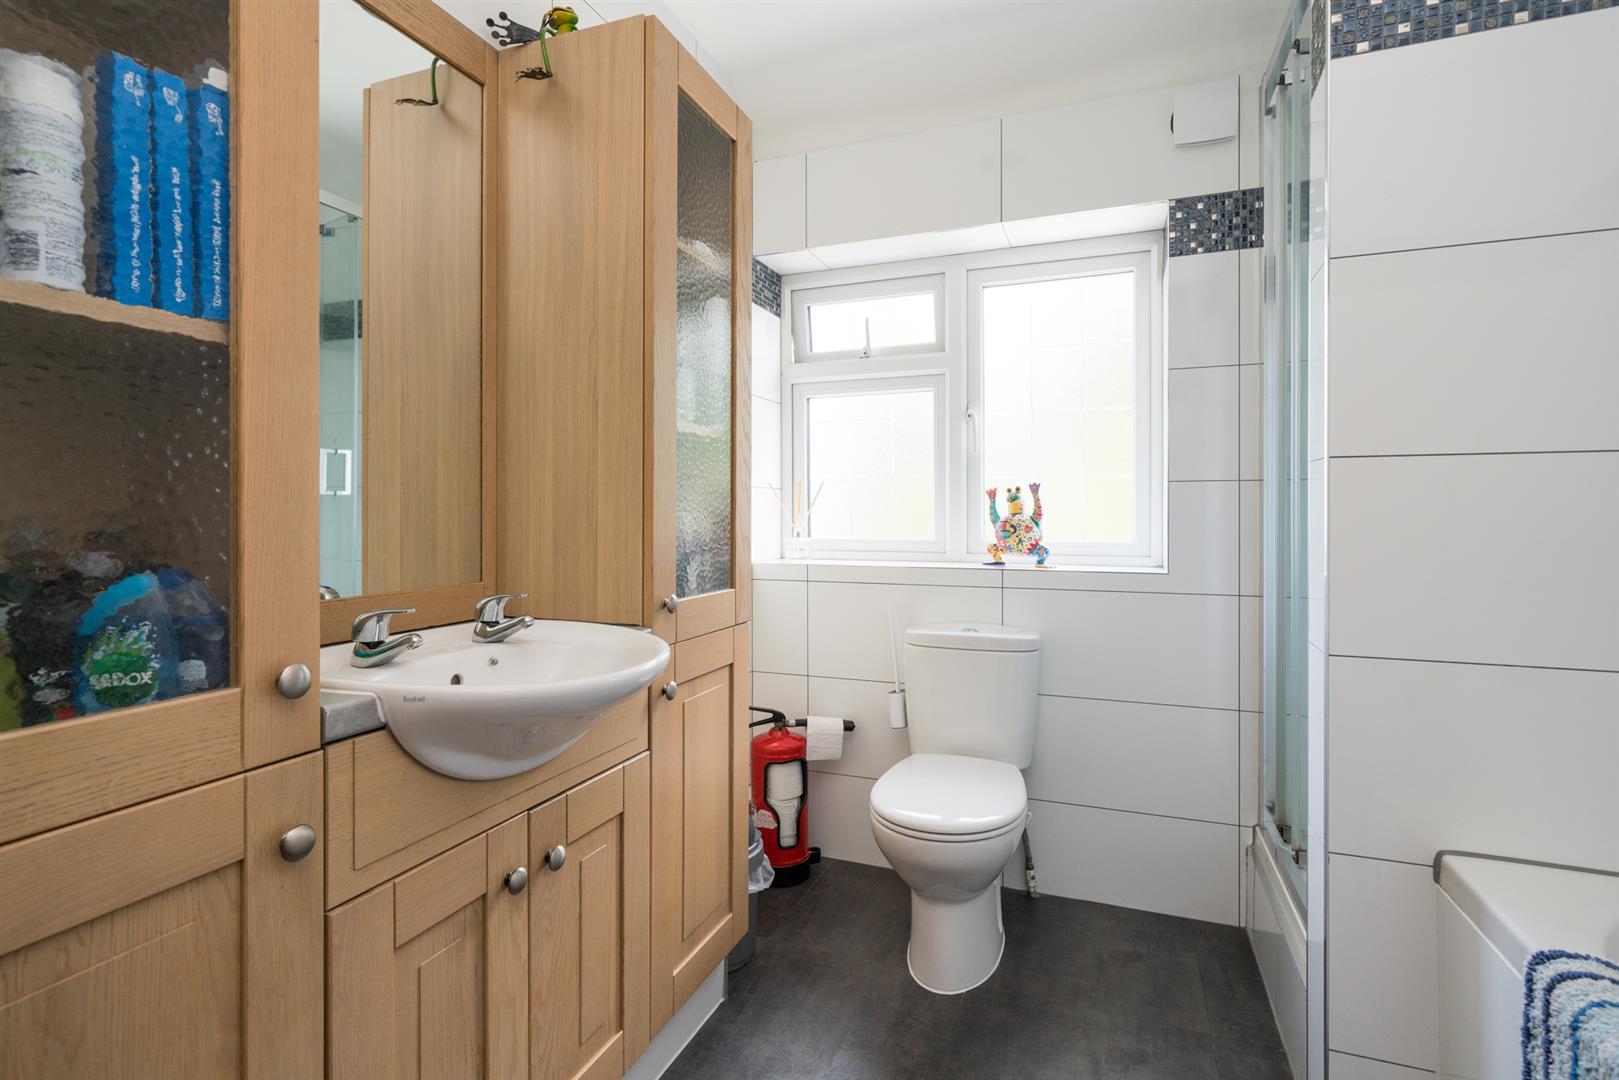 12-Ranelagh-Road-1021- bathroom 1.jpg